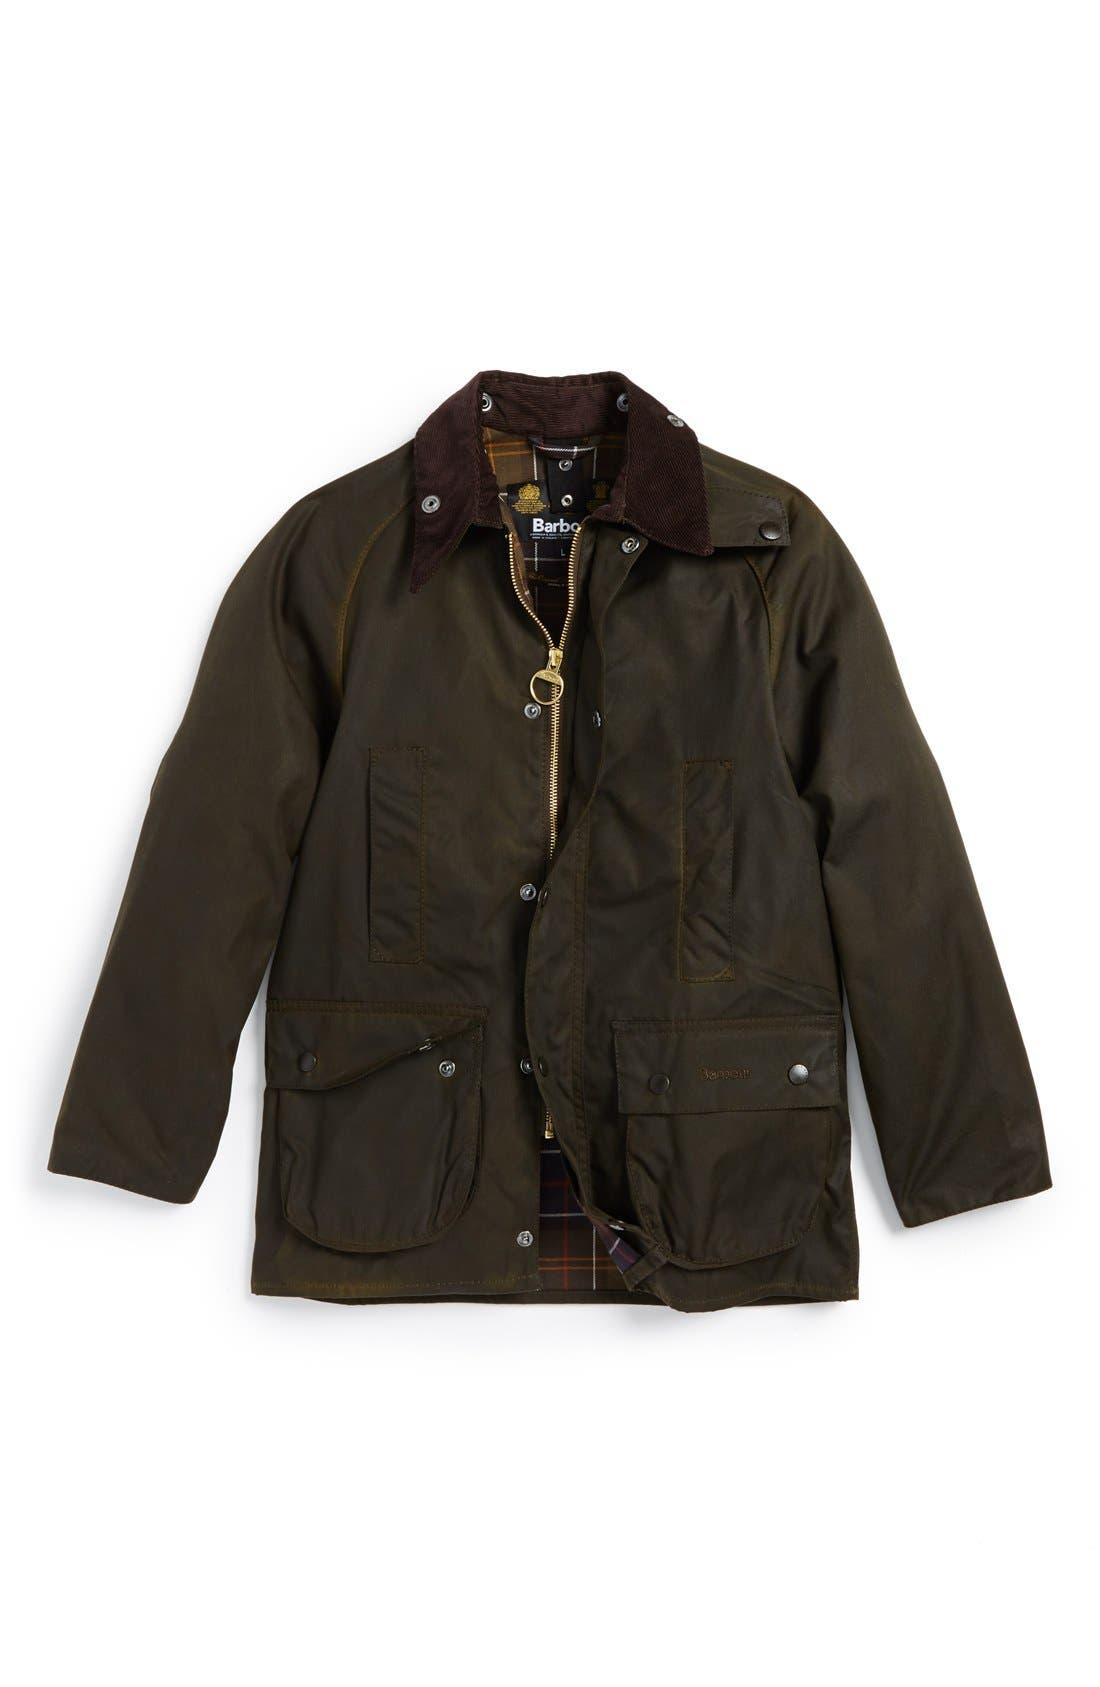 Main Image - Barbour 'Classic Beaufort' Waterproof Waxed Cotton Jacket (Big Boys)